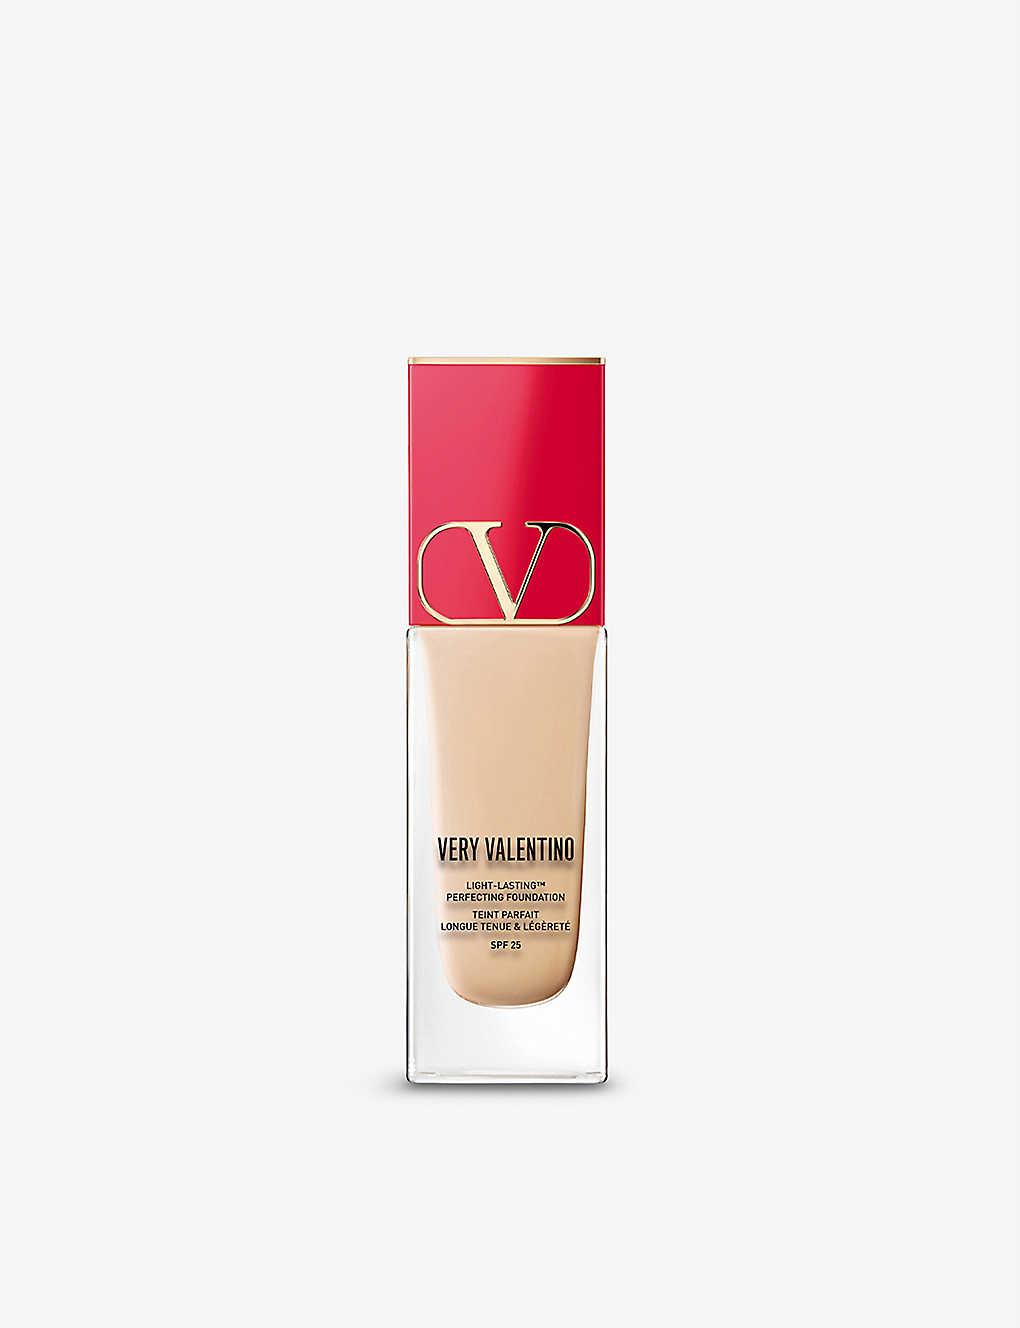 Valentino Beauty Very Valentino Foundation